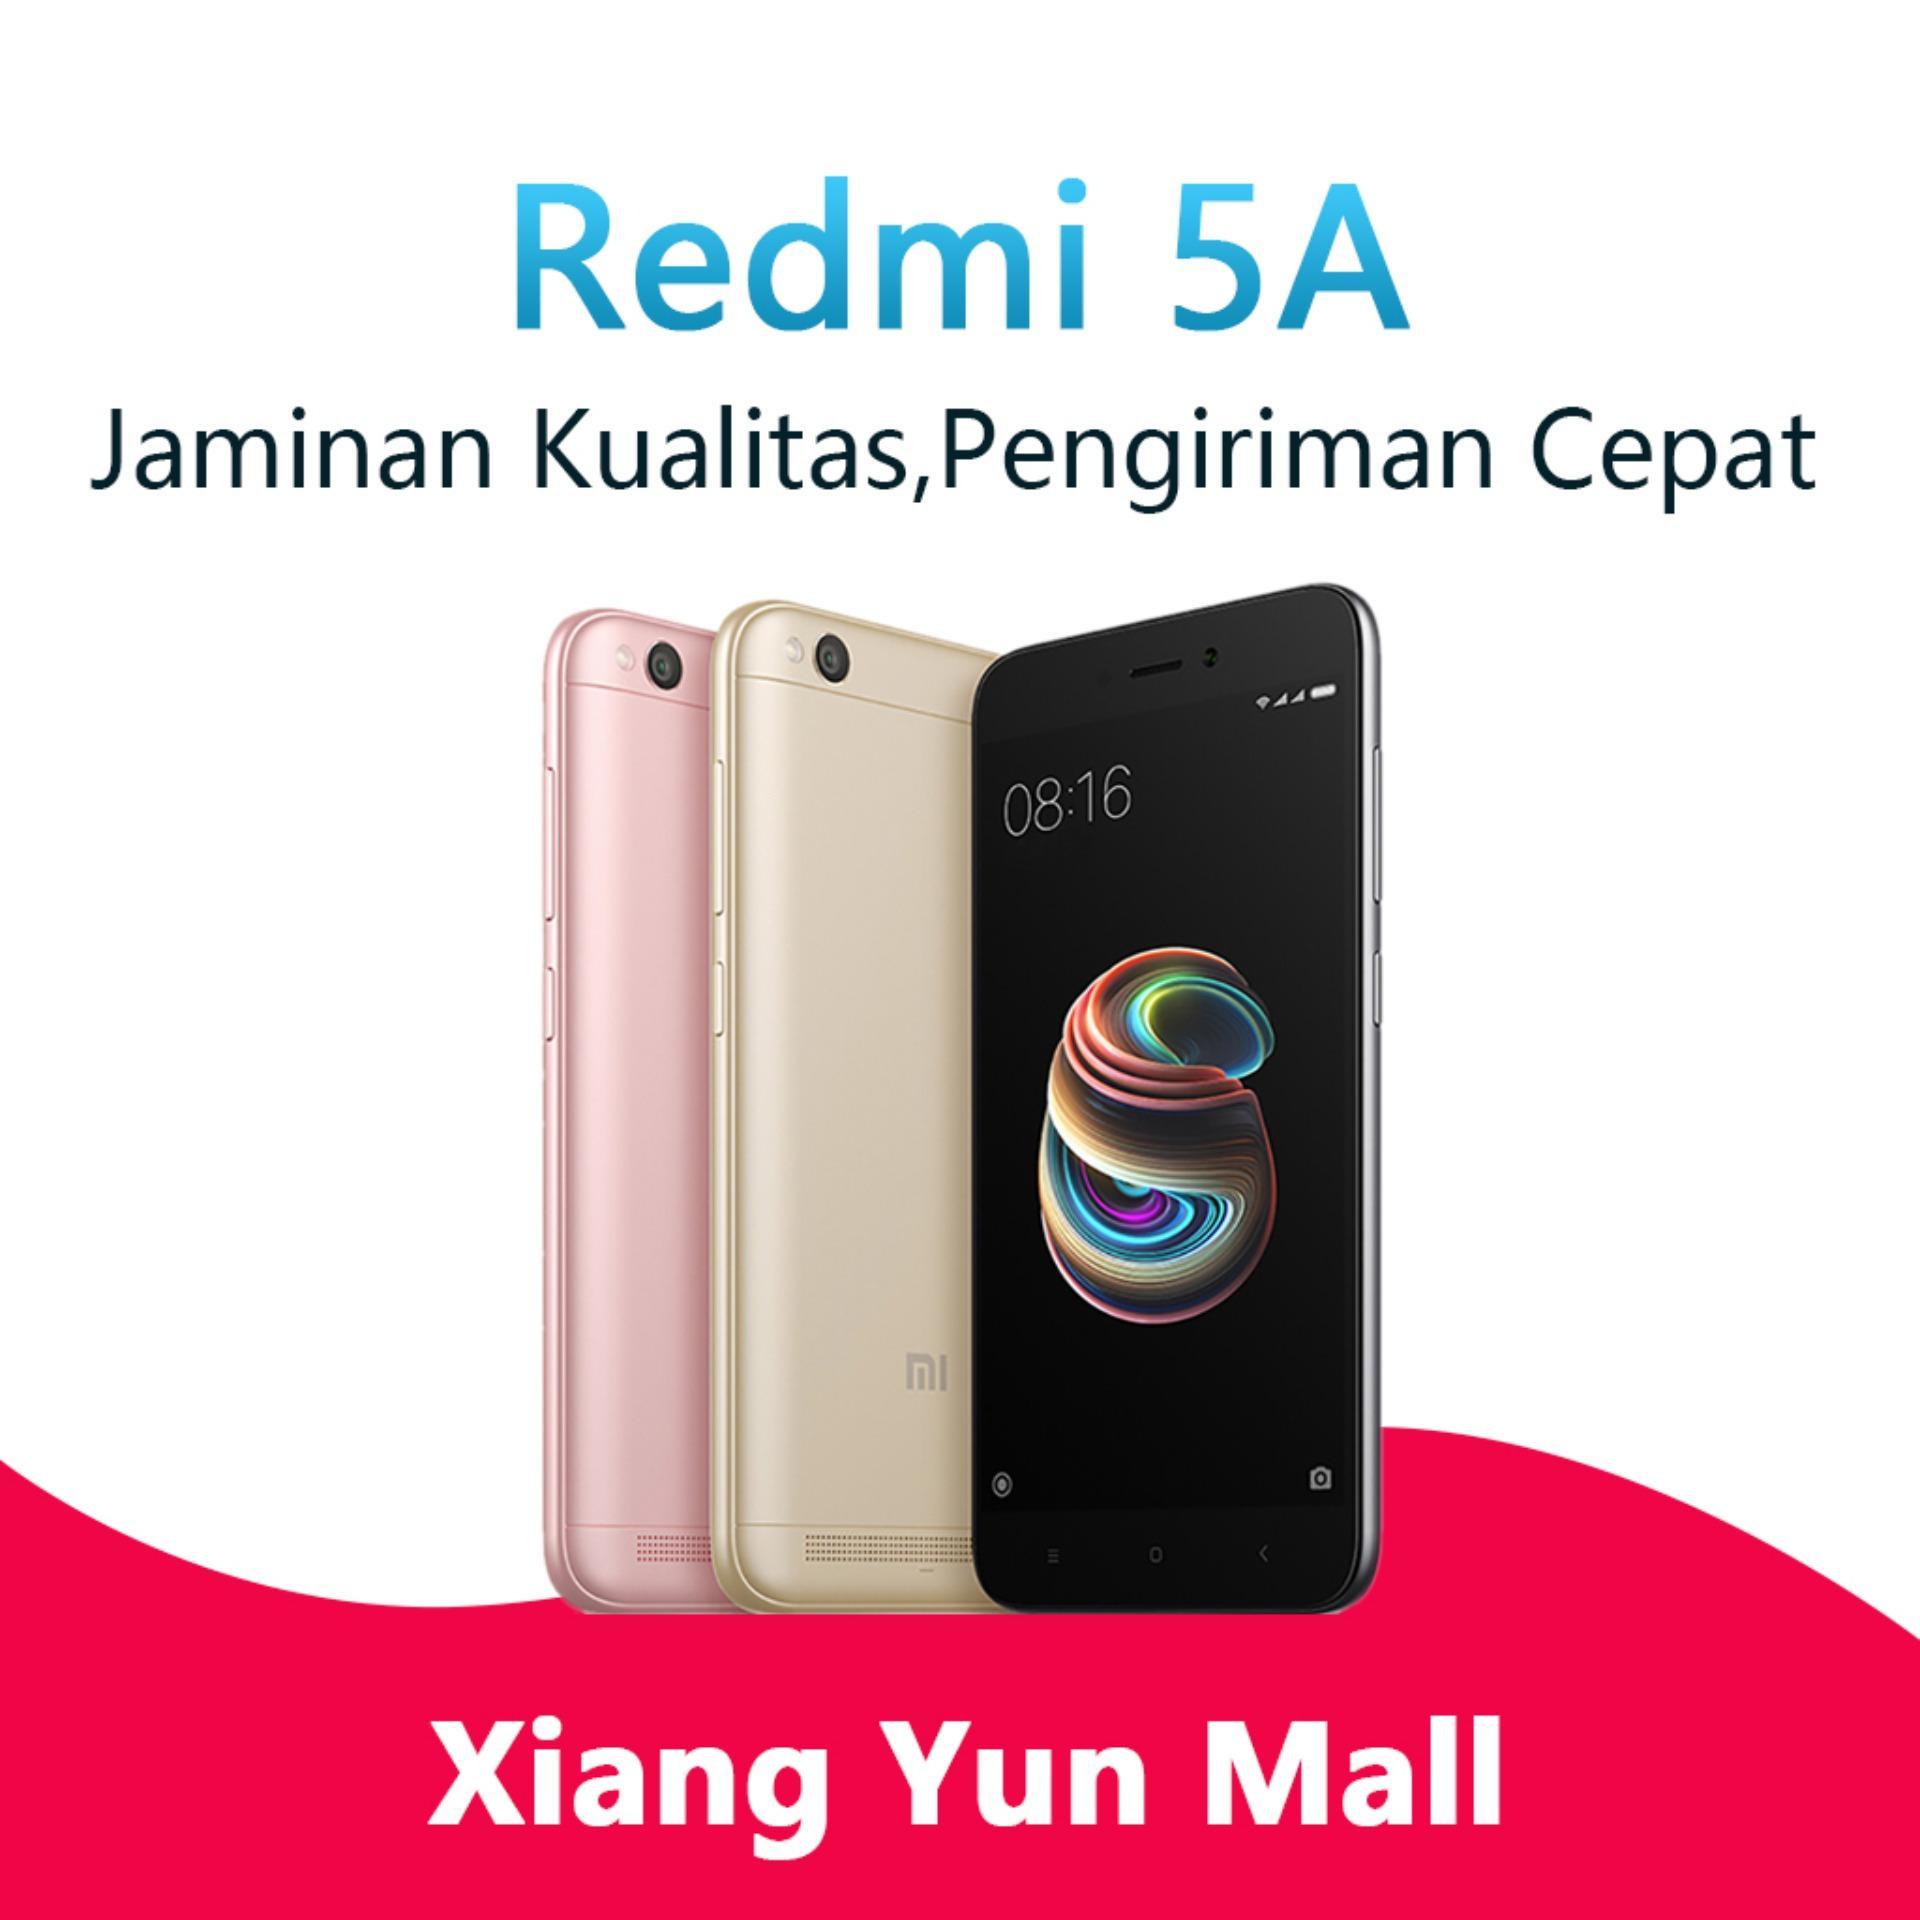 Harga Iphone 6 16gb Gold Distributor 1 Tahun Platinum Lengkap Garansi Thn Xiaomi Redmi 5a 2gb Snapdragon 425